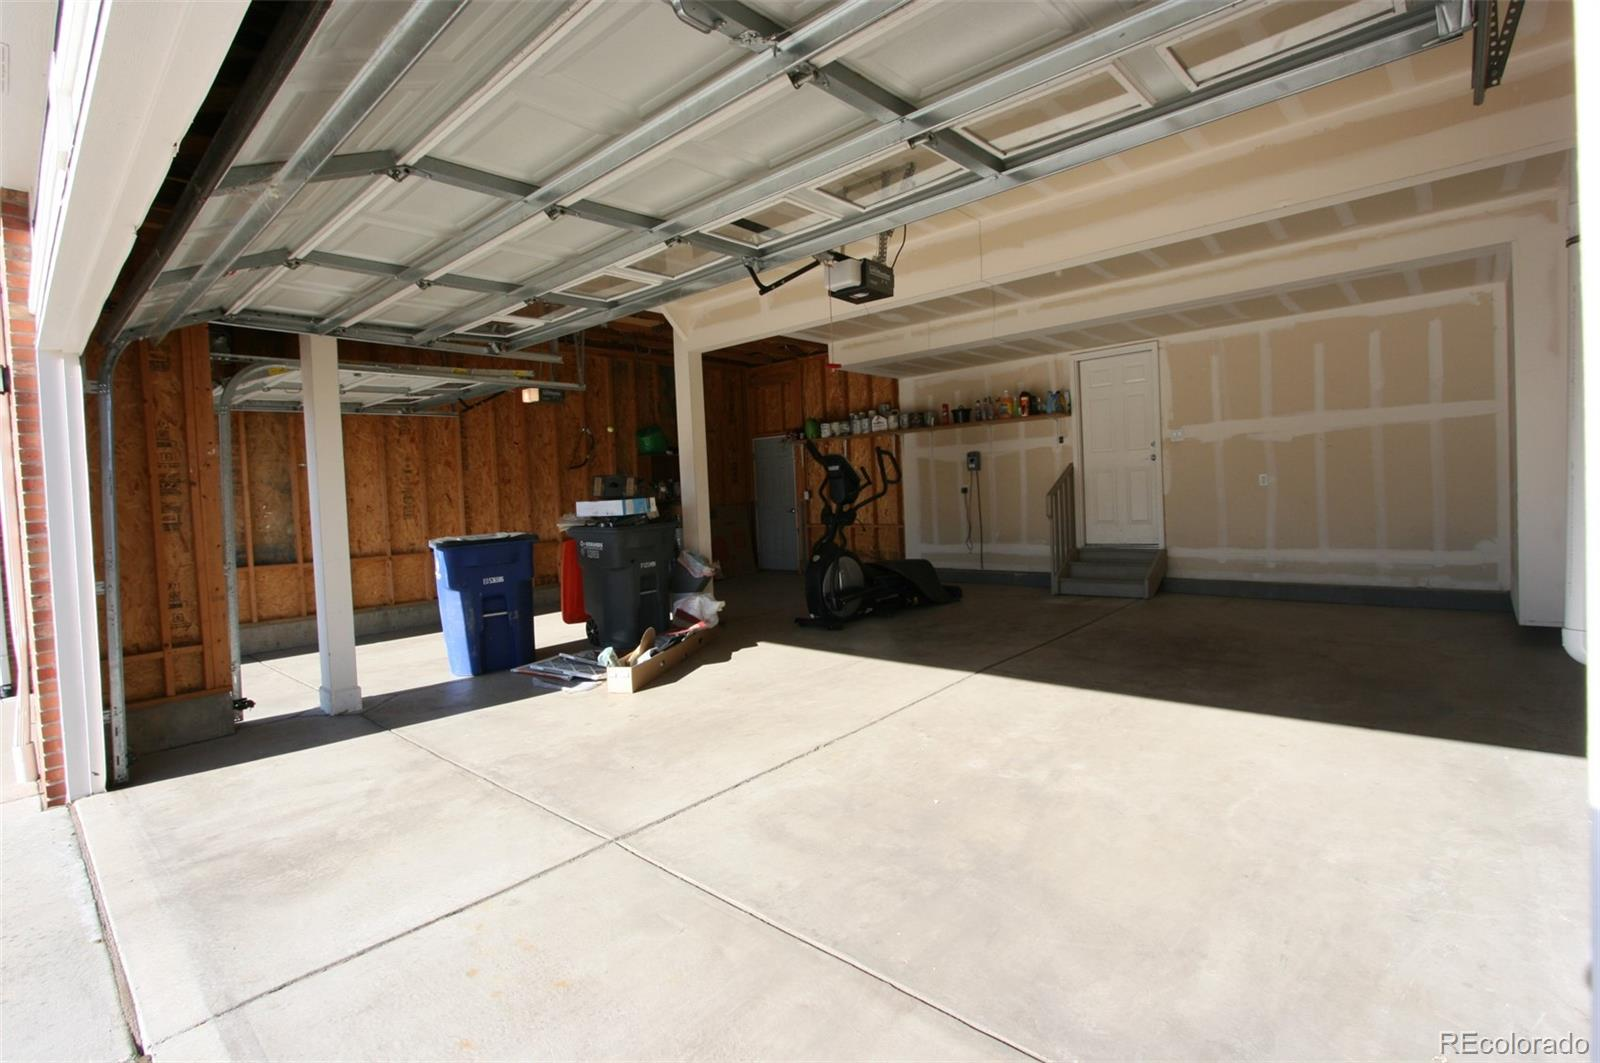 MLS# 8179440 - 25 - 2183 Alpine Drive, Erie, CO 80516